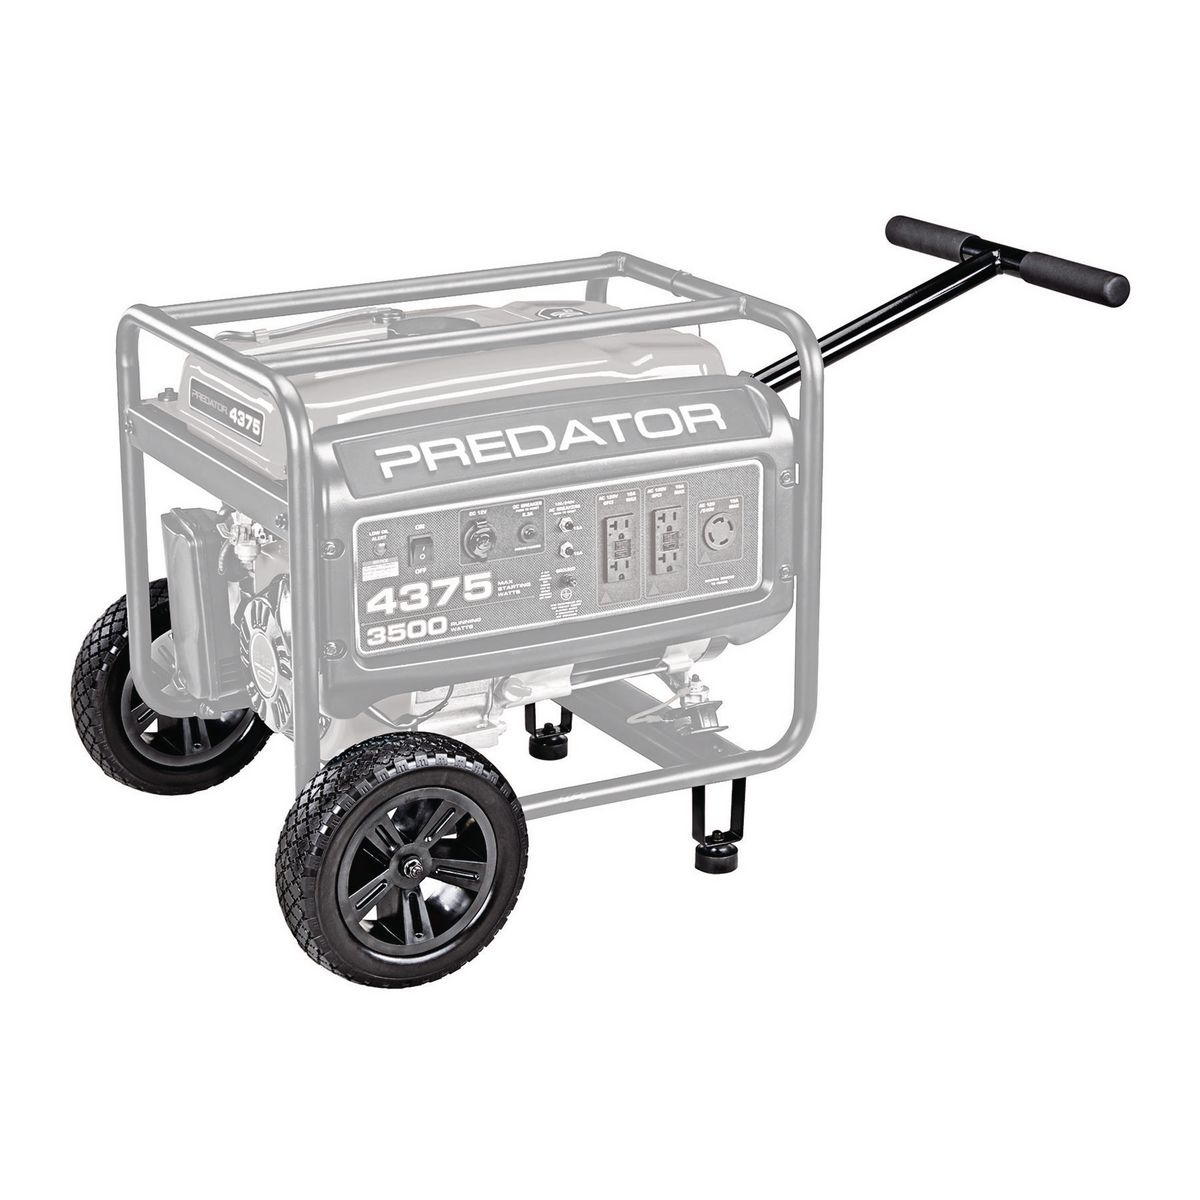 PREDATOR 10 in. Heavy Duty Generator Wheel Kit - Item 64788